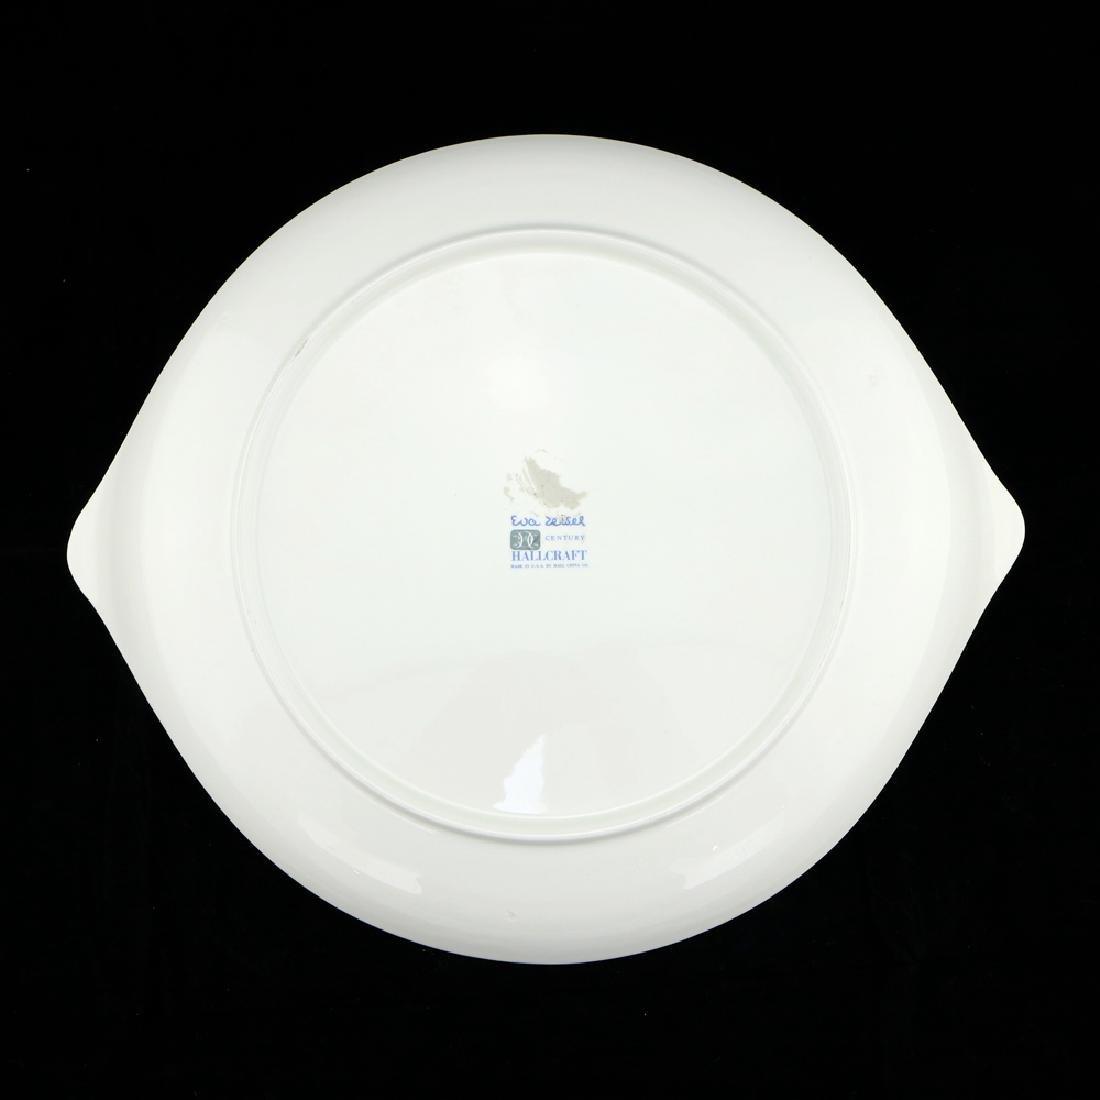 Zeisel Hallcraft Century Nesting Serving Bowls - 5